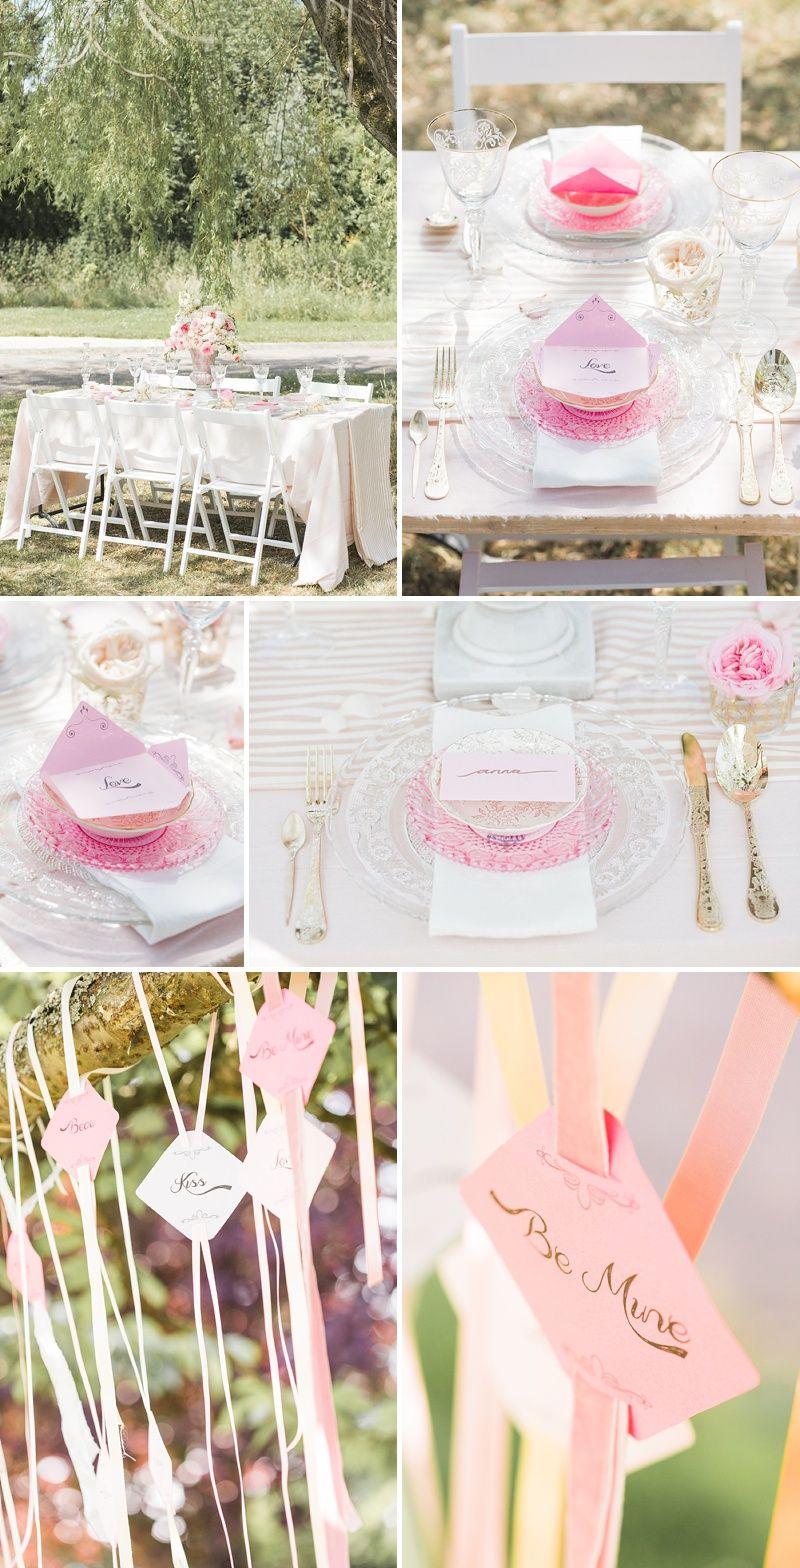 DIY Hanging Decor & Wedding table stationery   DIY wedding, Wedding ...